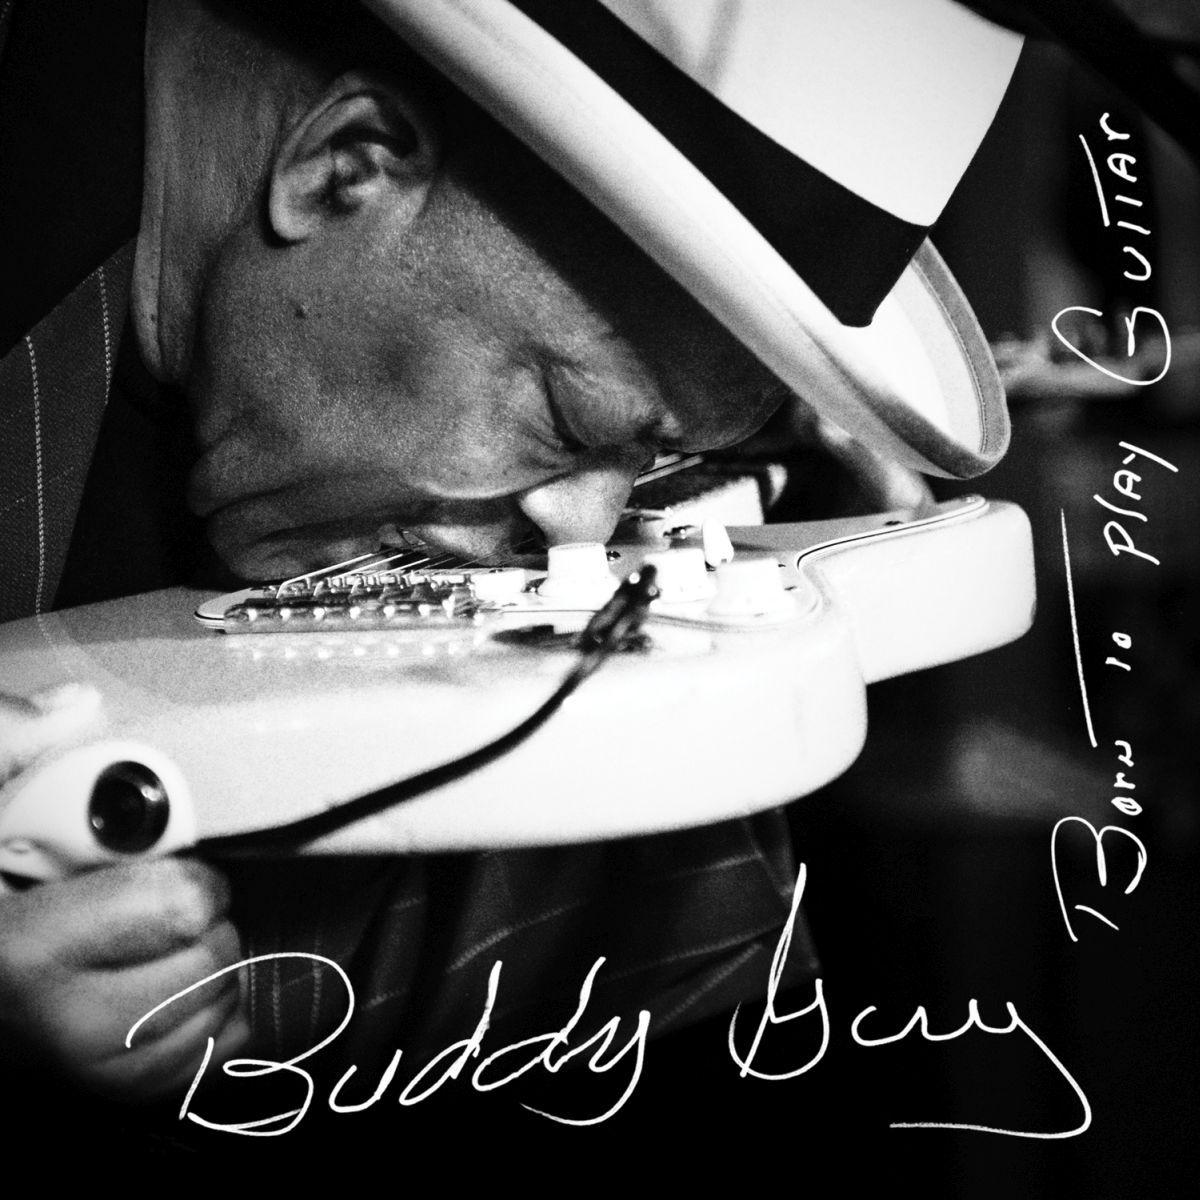 Guy Buddy – Born To Play Guitar